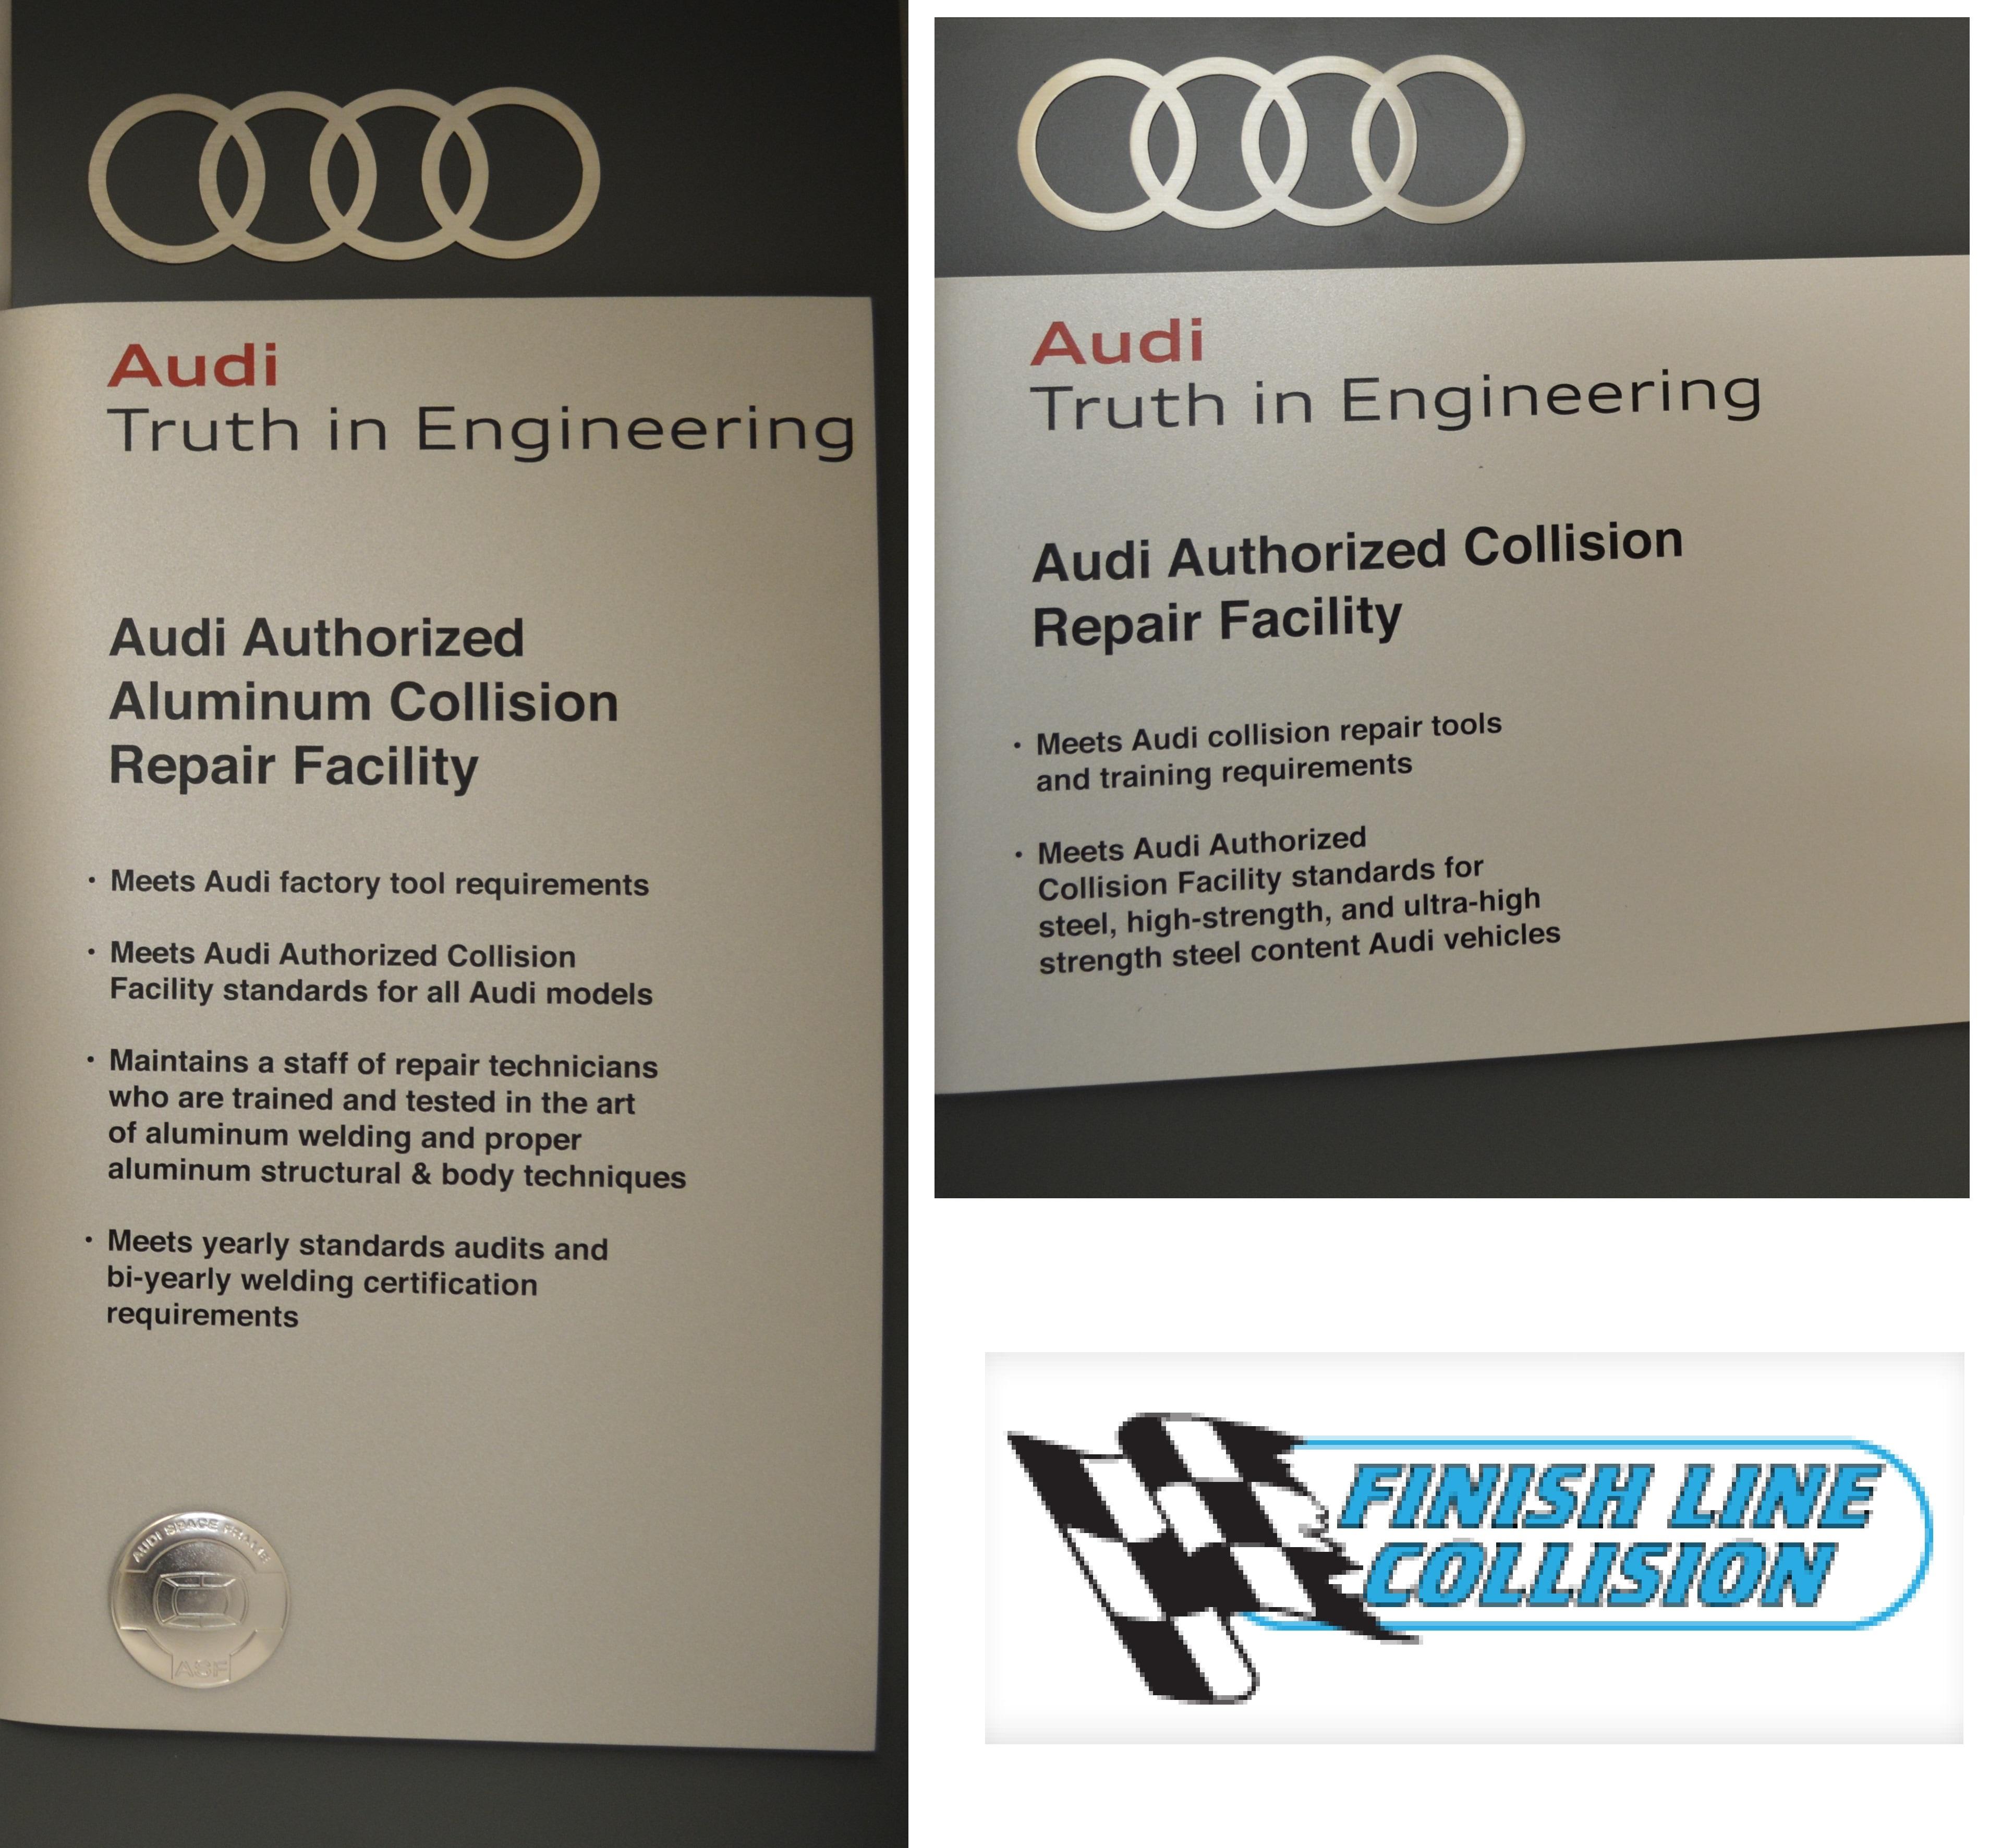 Audi Collision Center Audi Repairs In Leesport PA - Audi certified collision repair